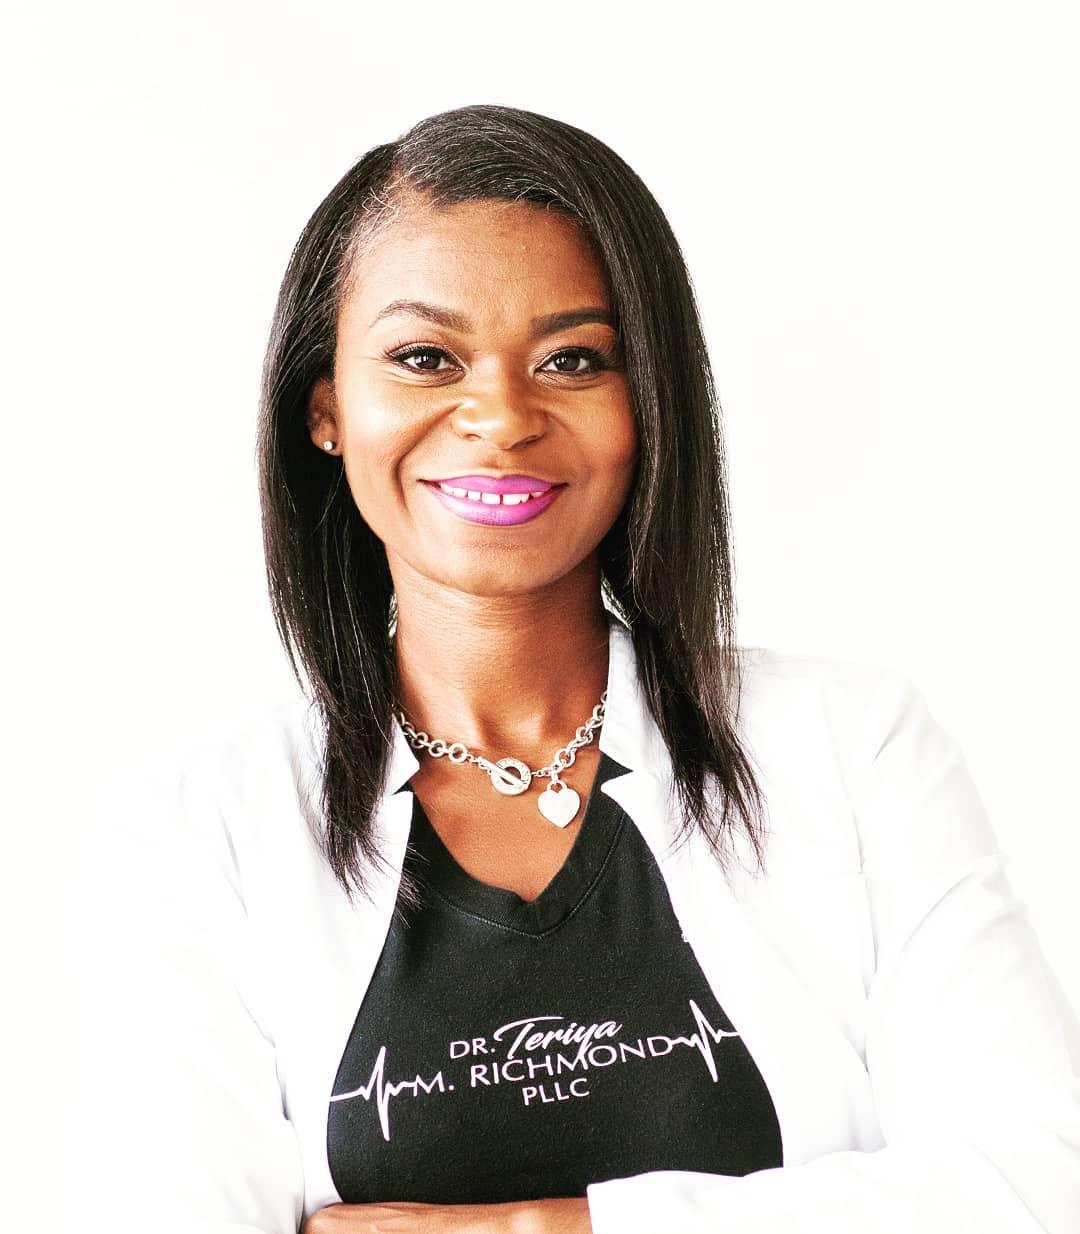 Dr. Teriya Richmond